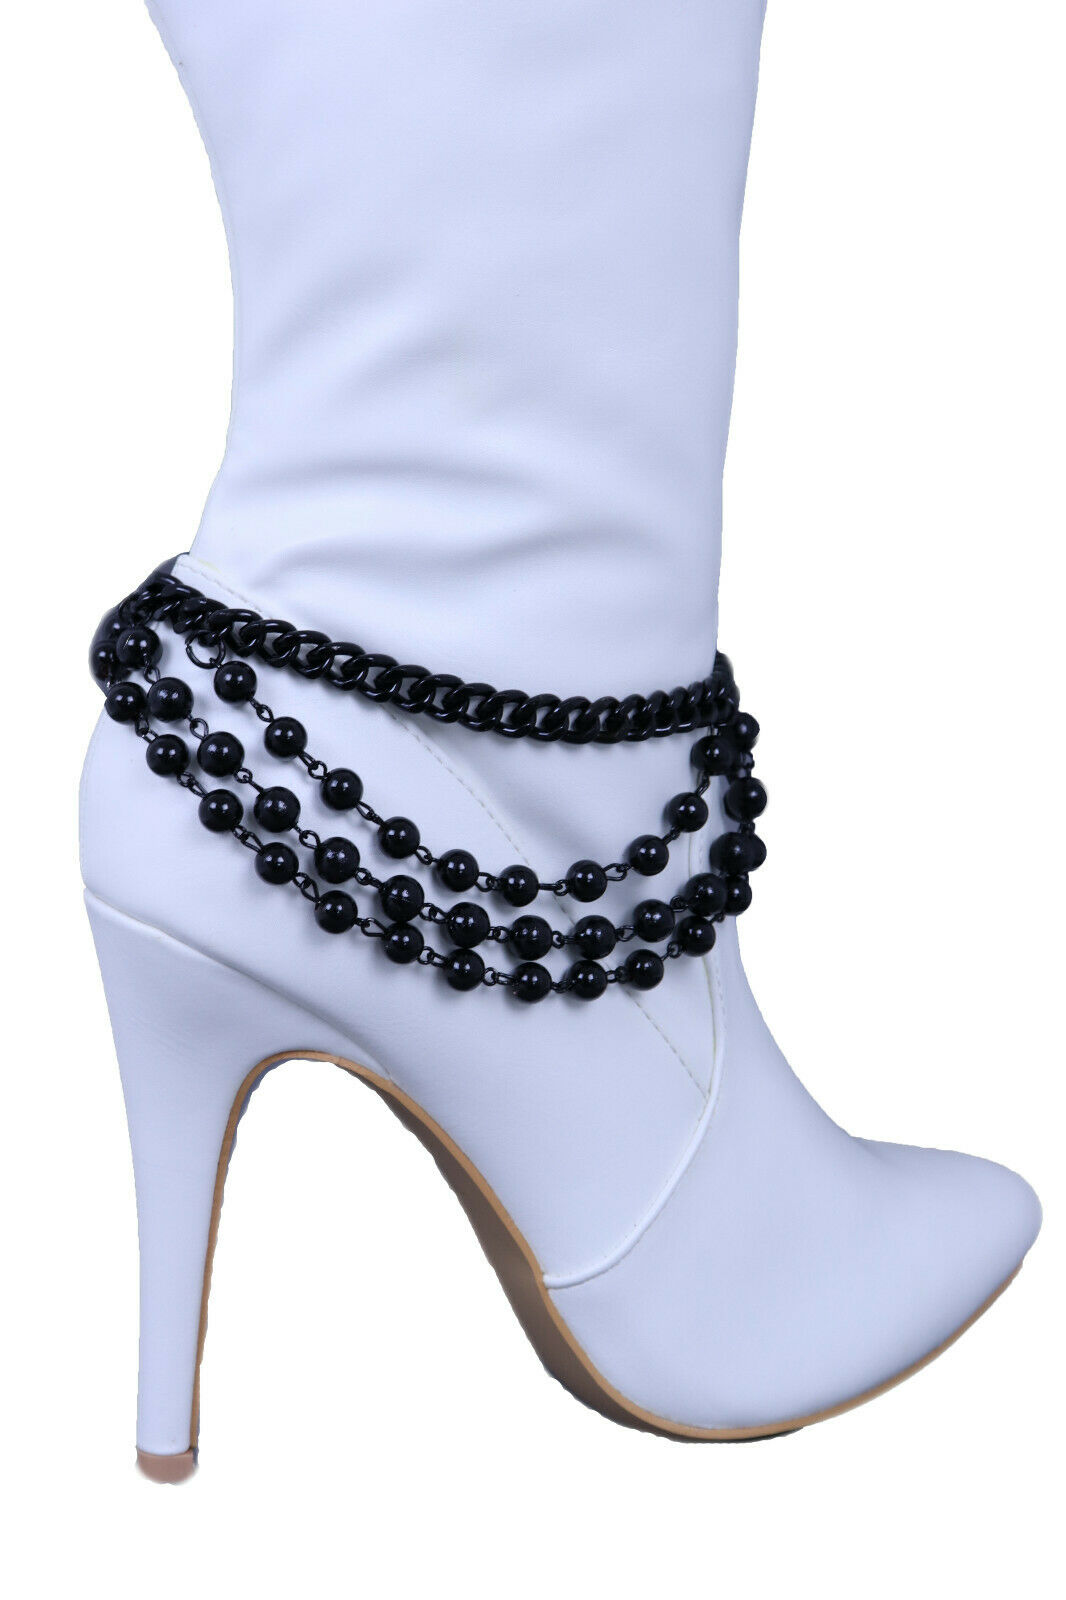 Women Black Color Metal Chain Boot Bracelet Western Shoe Ball Charm Wrap Around